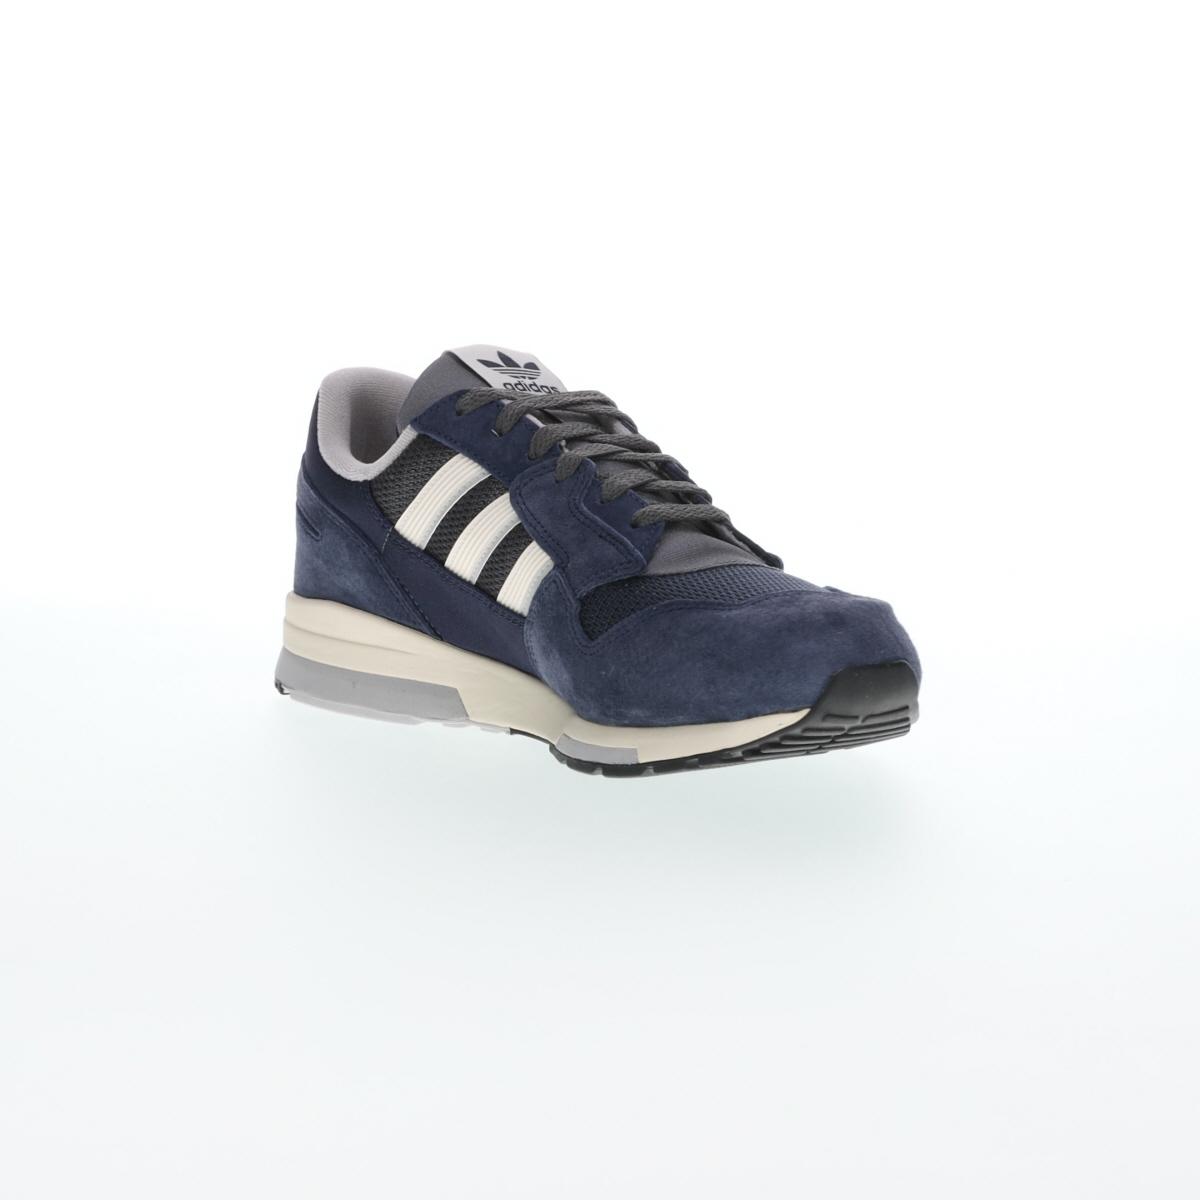 adidas sportswear online shop coupon